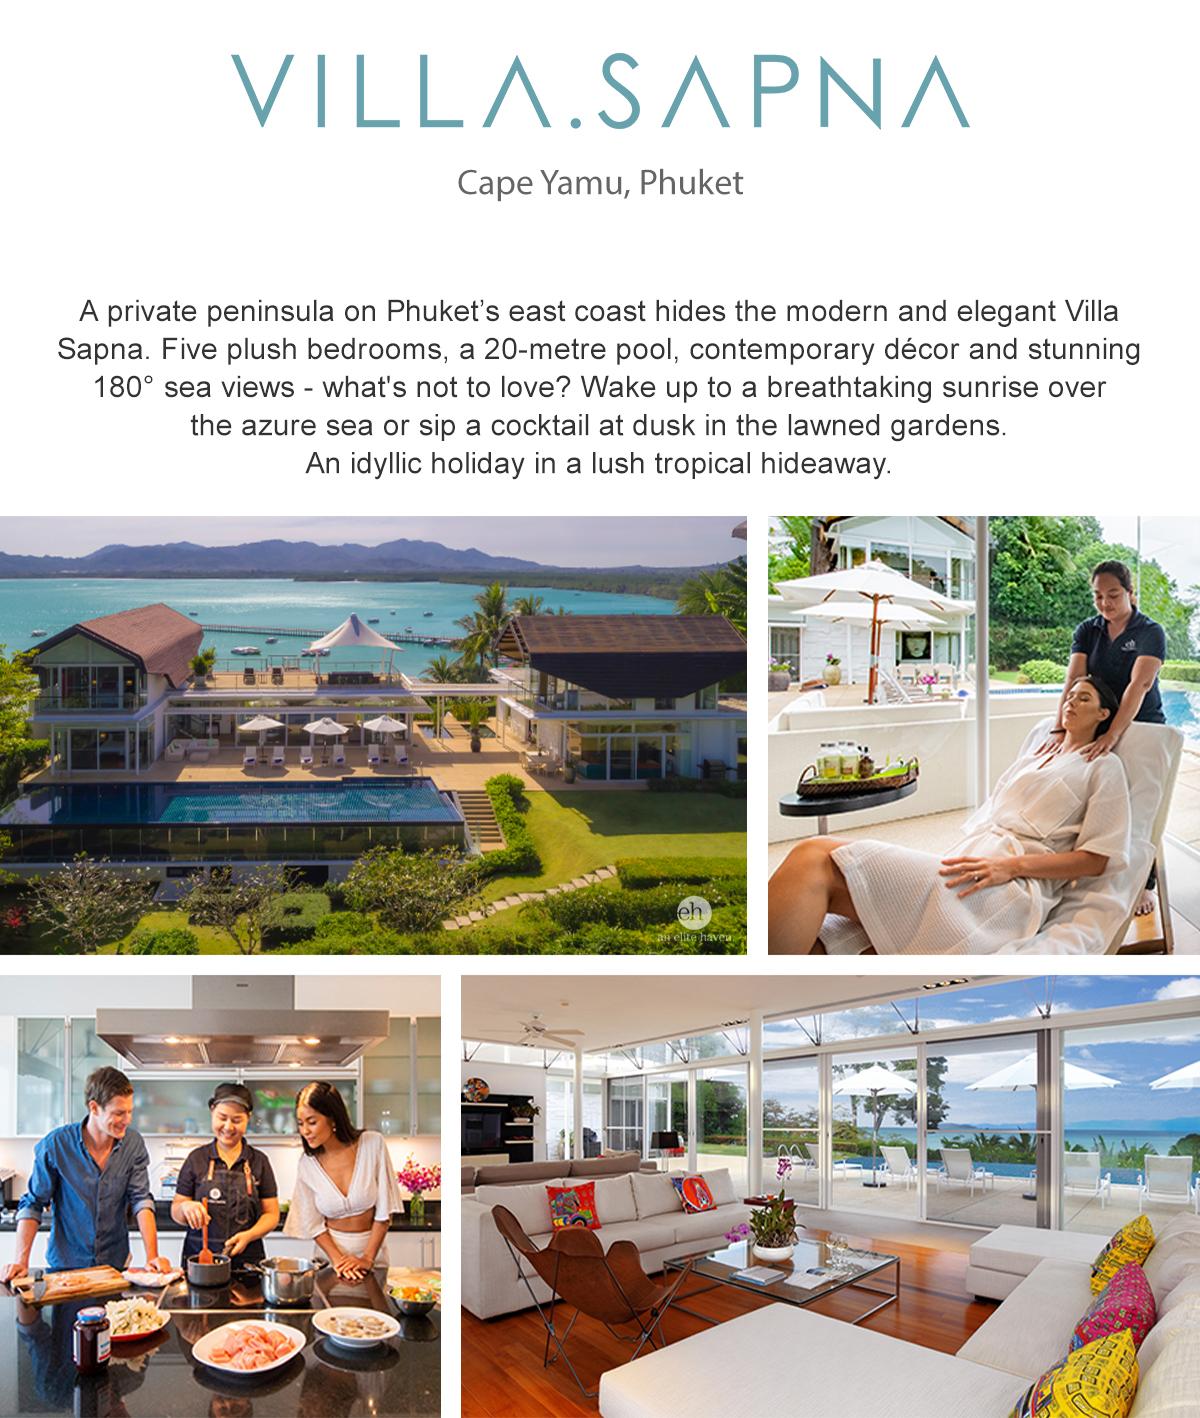 Villa Sapna - Cape Yamu, Phuket, Thailand